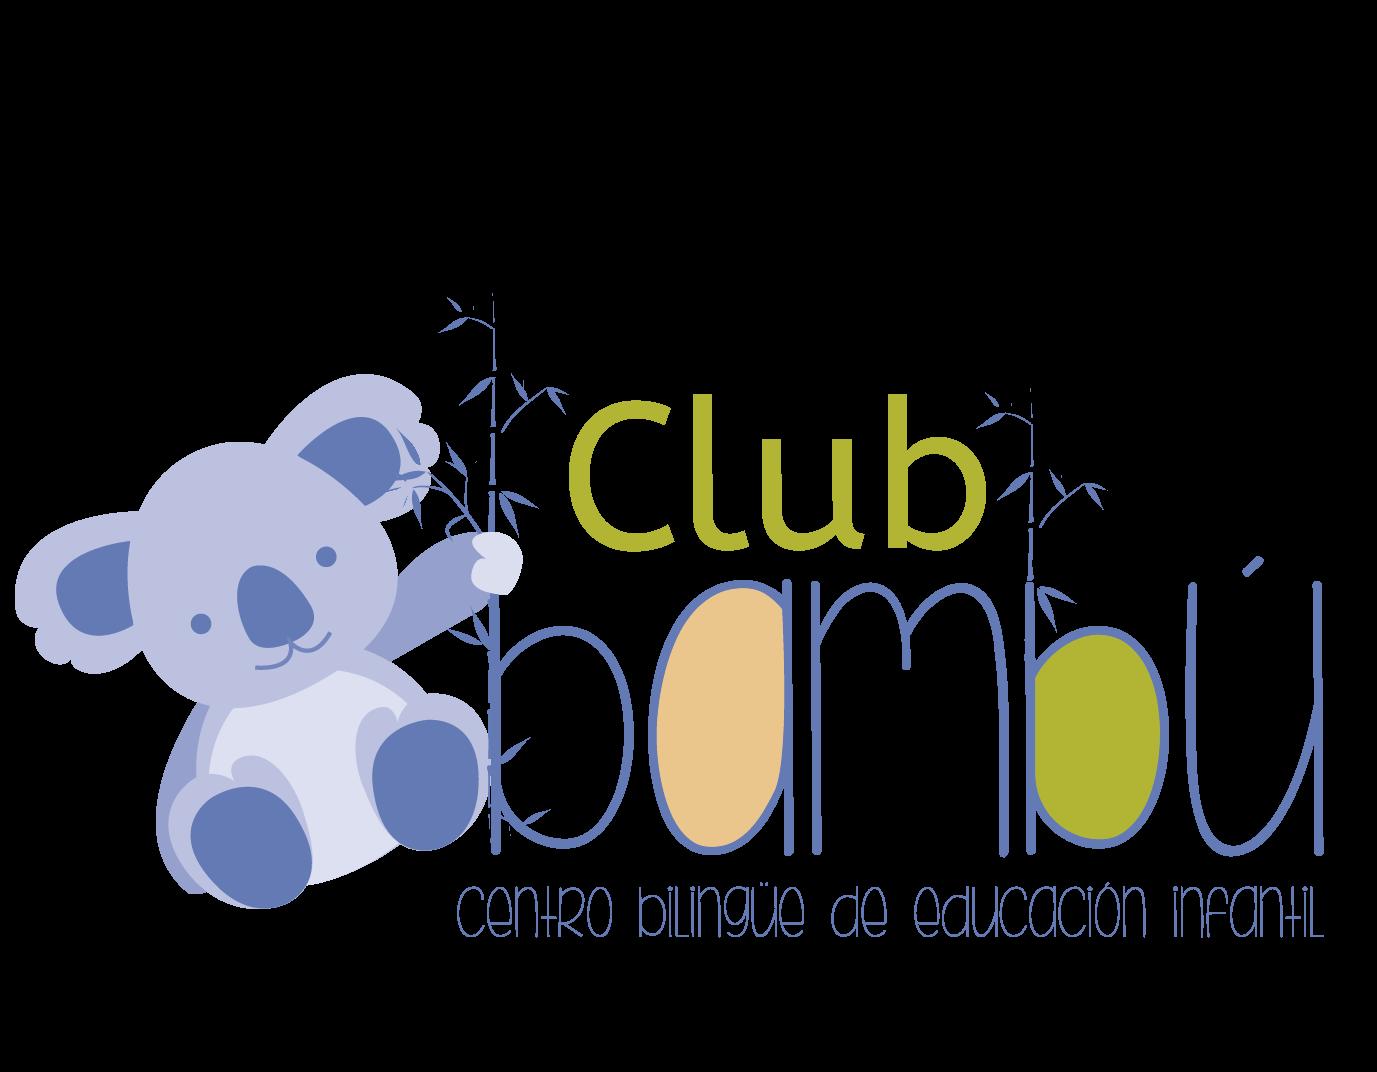 Club Bambu